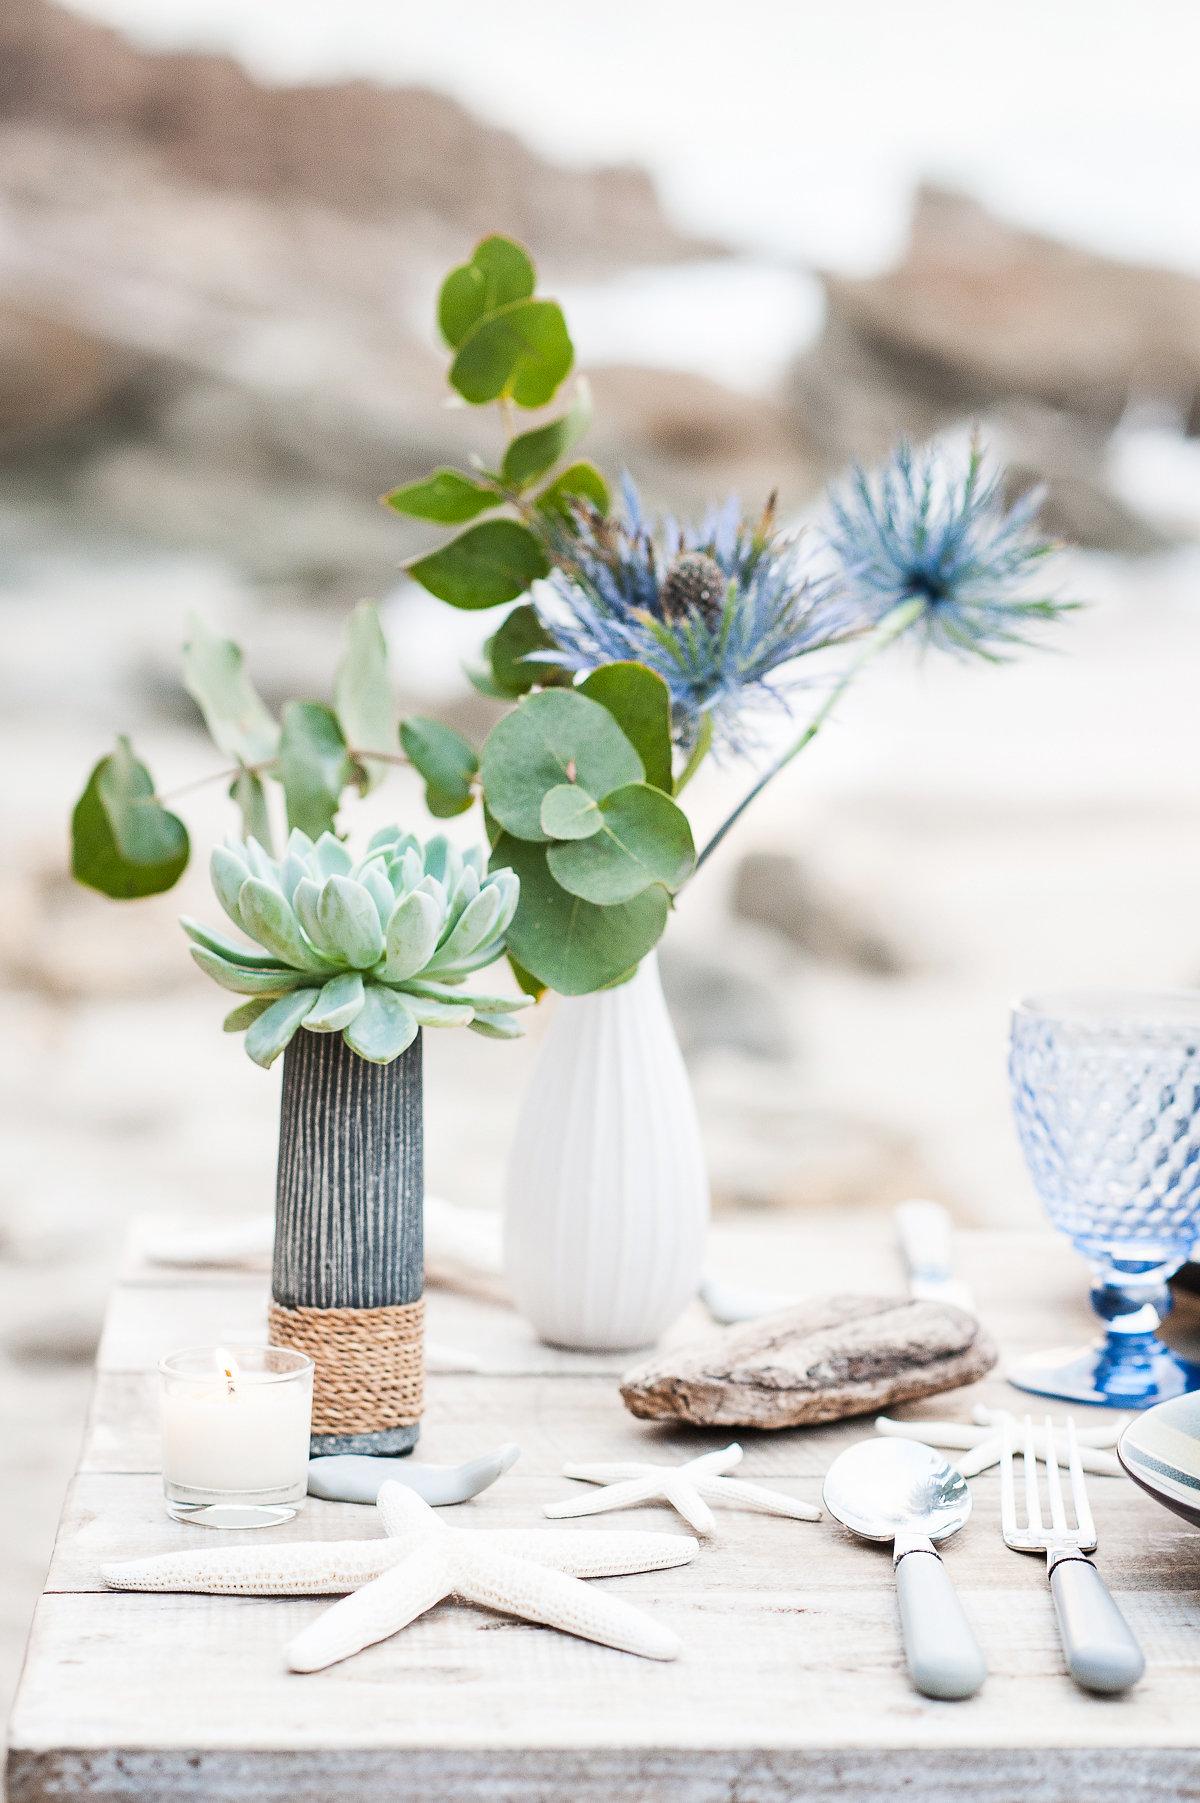 calista-one-lista-de-bodas-online-blog-de-bodas-inspiracion-decoracion-mesas-paula-franco-18